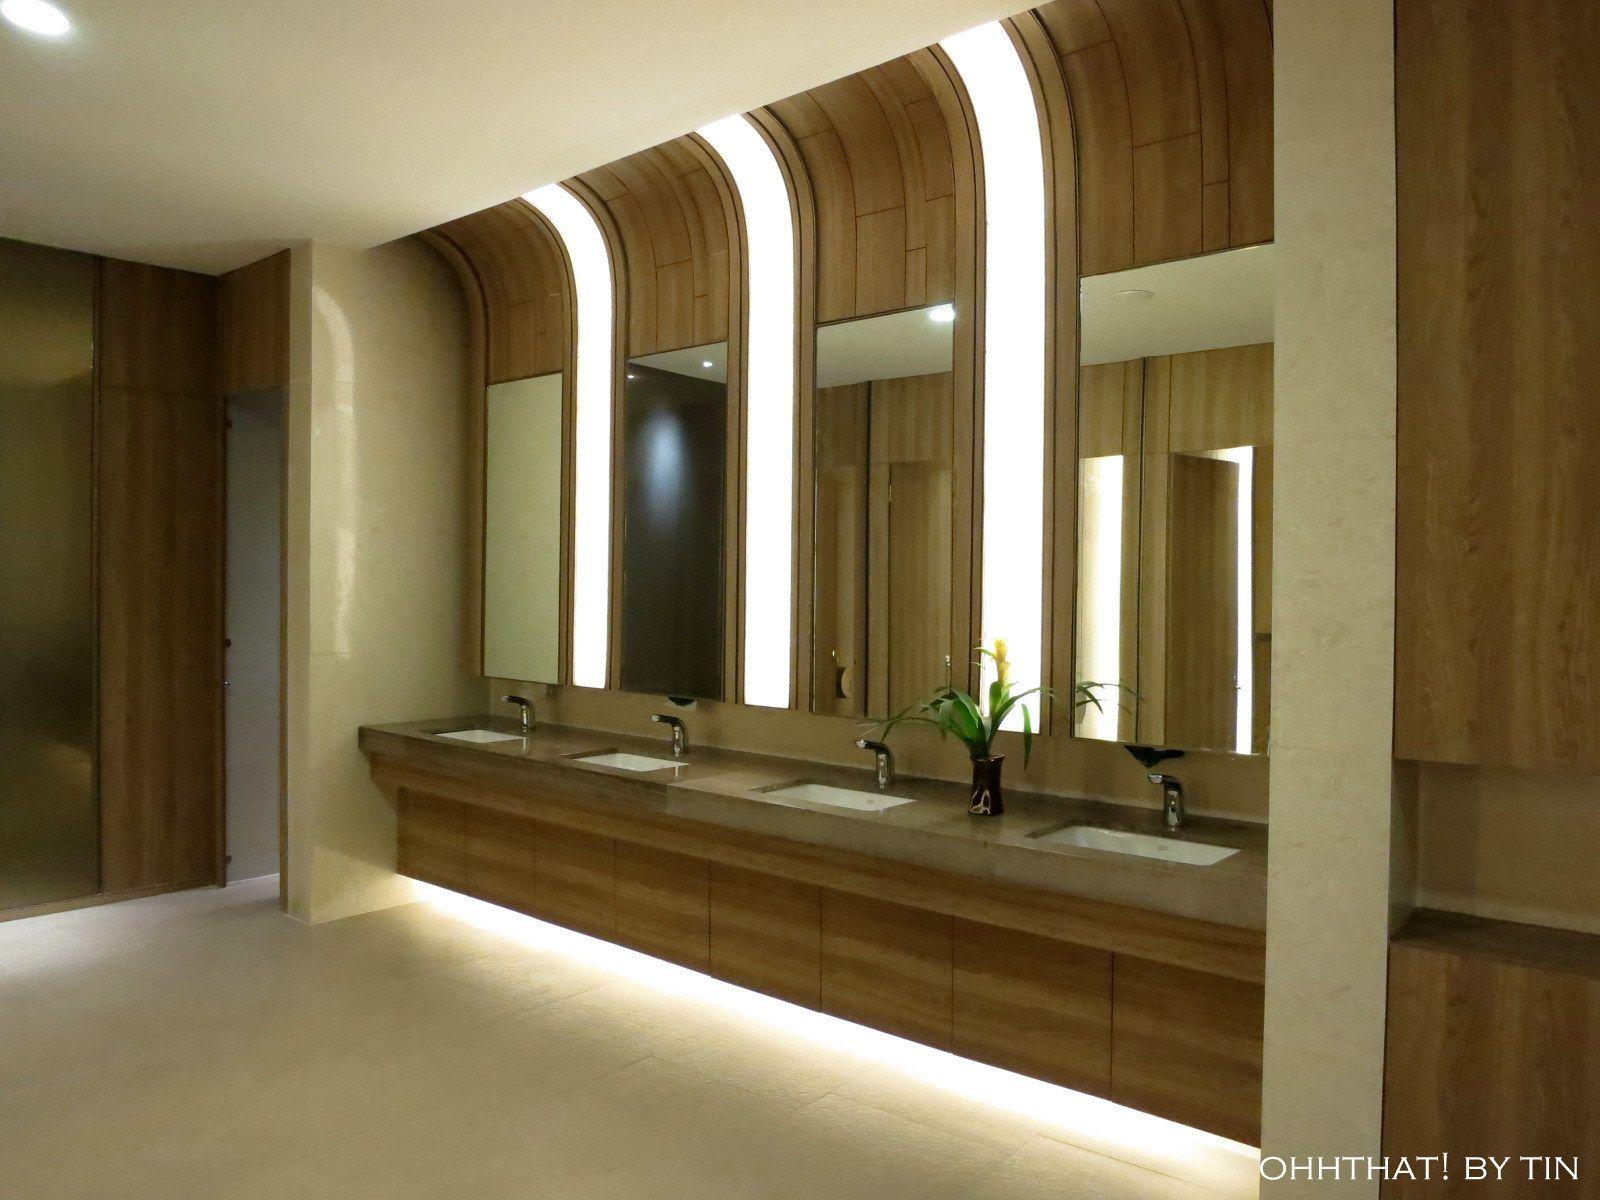 Public bathroom designs - Ohhthat By Tin Ikkoryu Fukuoka Ramen At Shangri La Plaza East Wing Public Hotelpublic Bathroomsshangri Larestroom Designrestroom